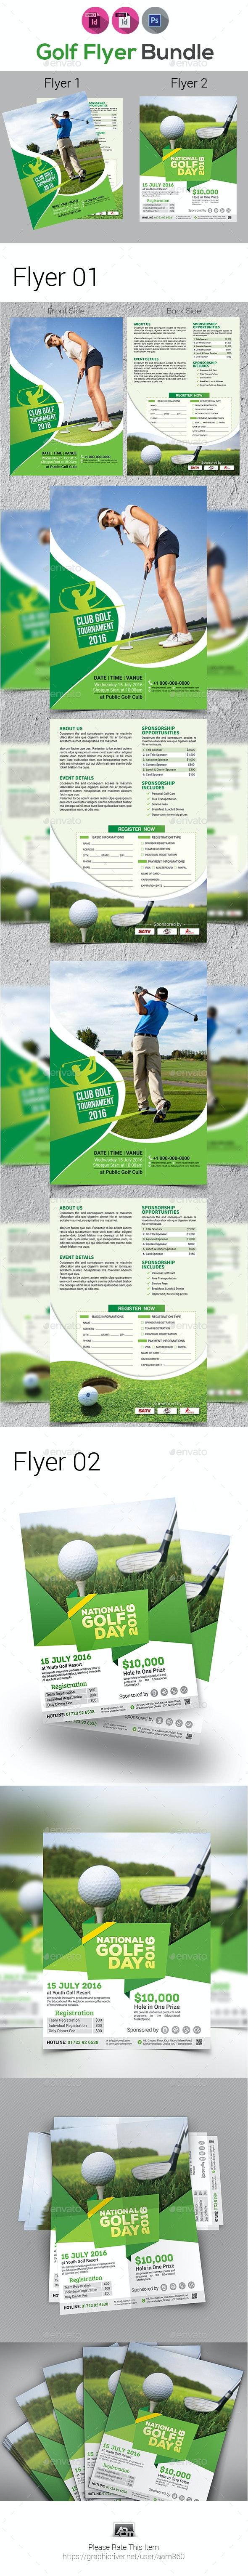 Golf Tournament Flyer Bundle Template - Sports Events